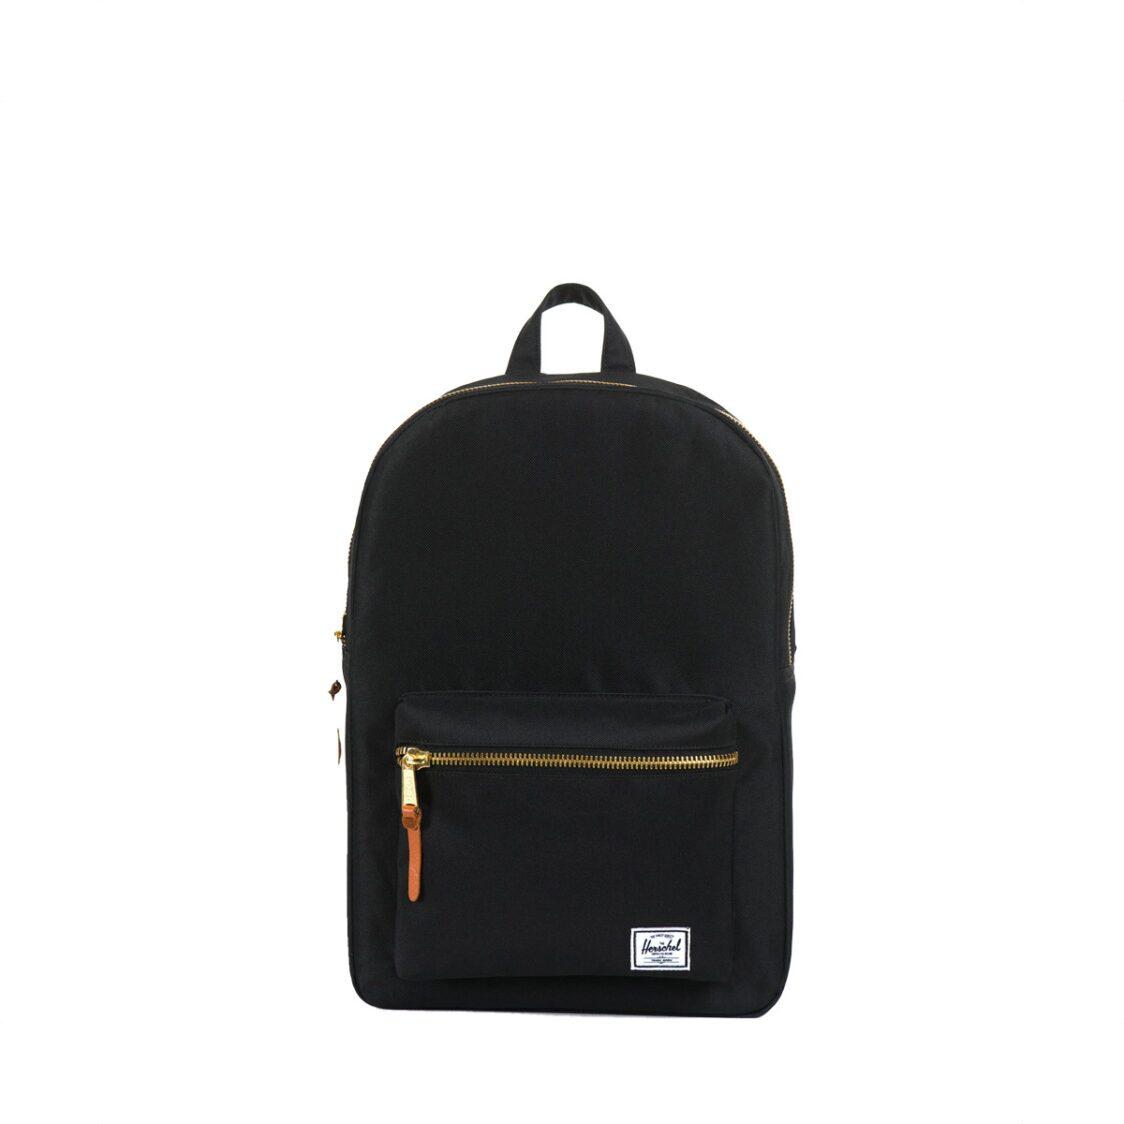 Herschel Settlement Mid-Volume Black Backpack 10033-00001-OS